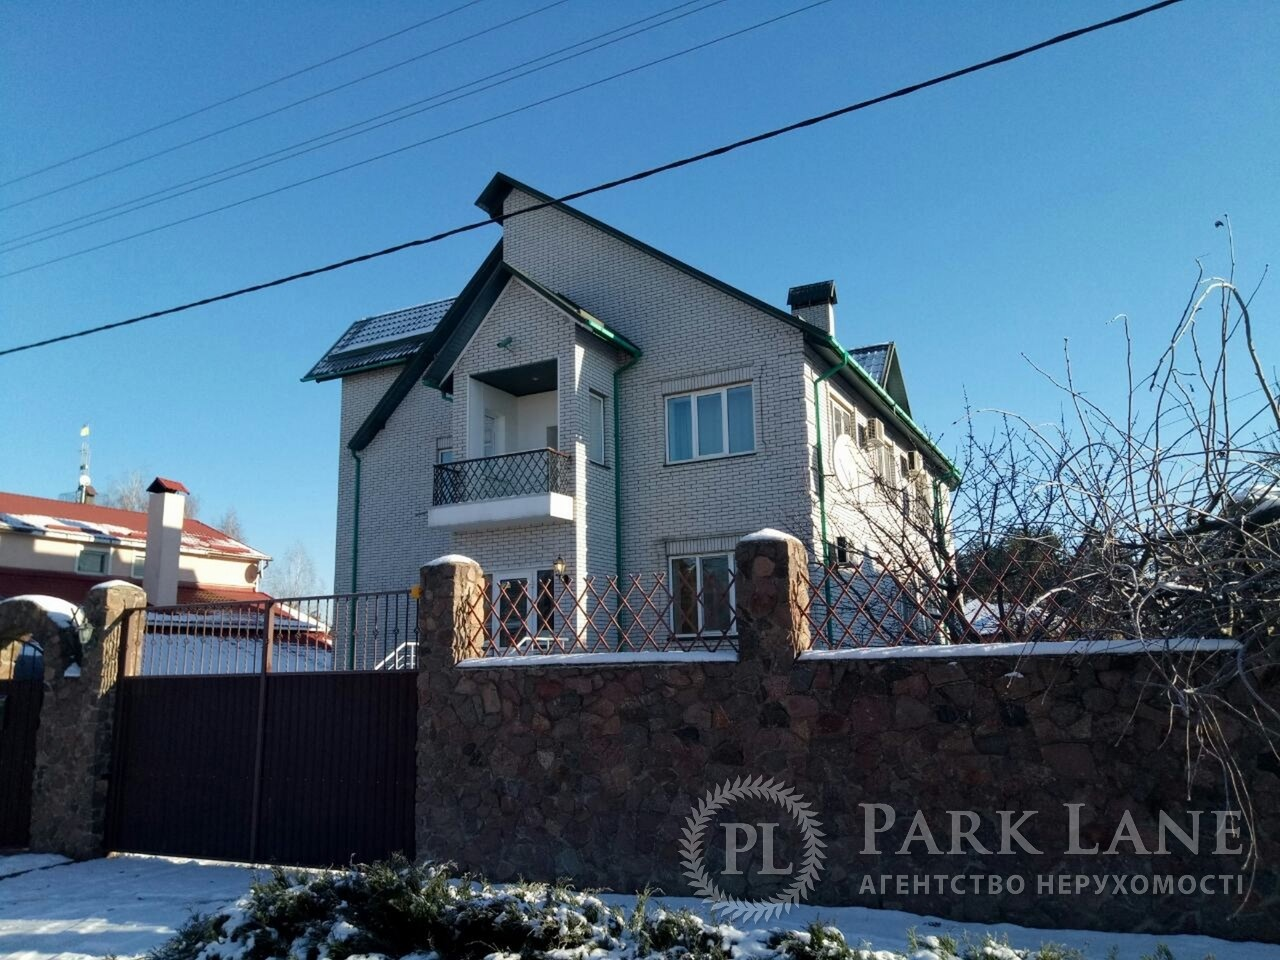 Дом ул. Независимости, Вита-Почтовая, Z-229858 - Фото 1